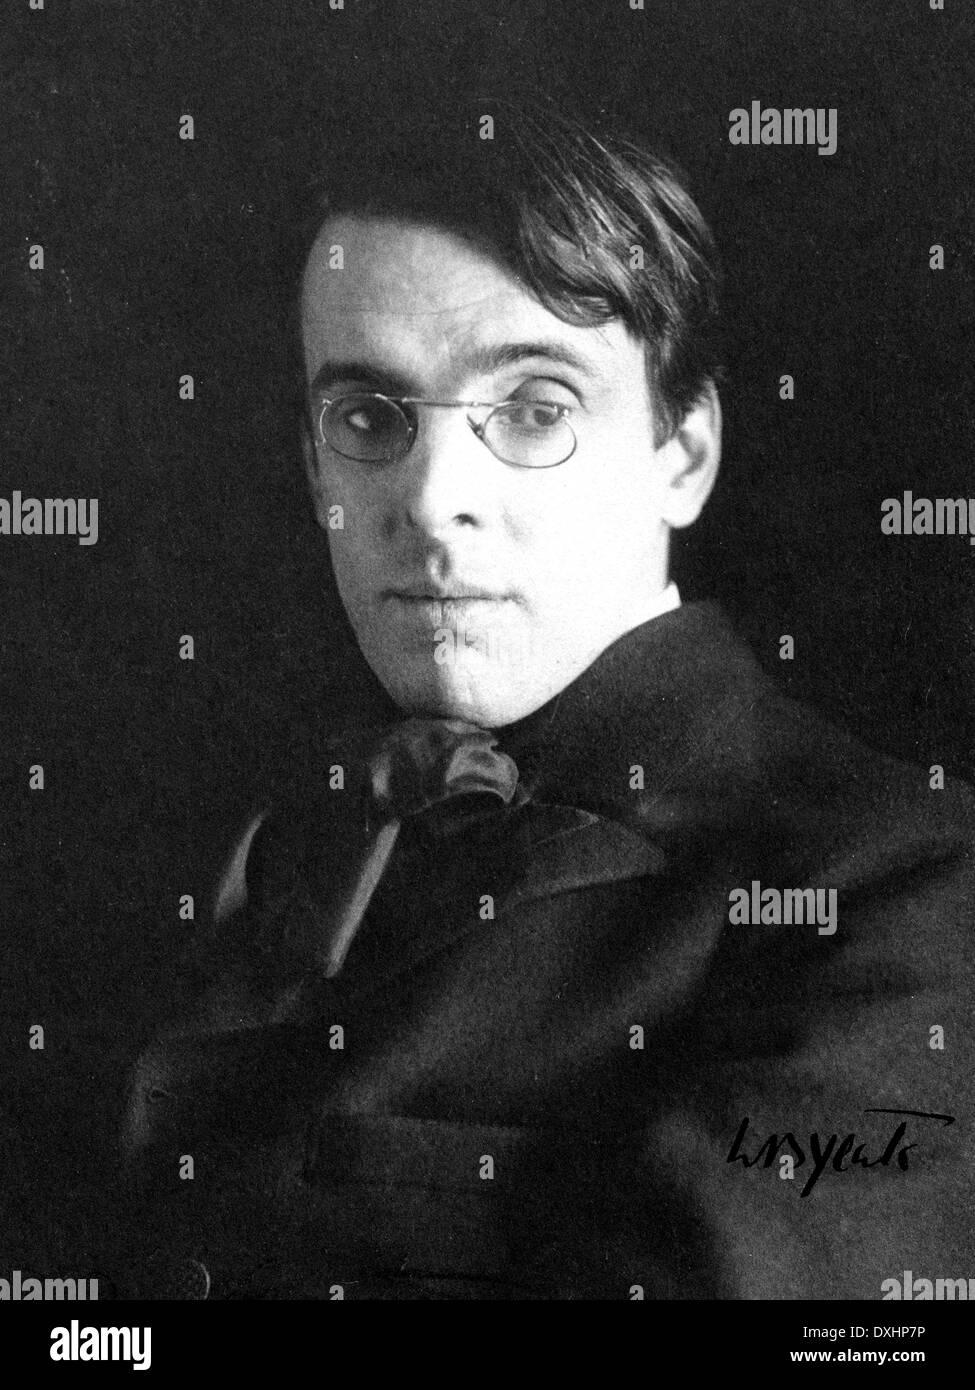 W.B. YEATS (1865-1939) poète irlandais en 1903. Photo Alice Boughton Photo Stock